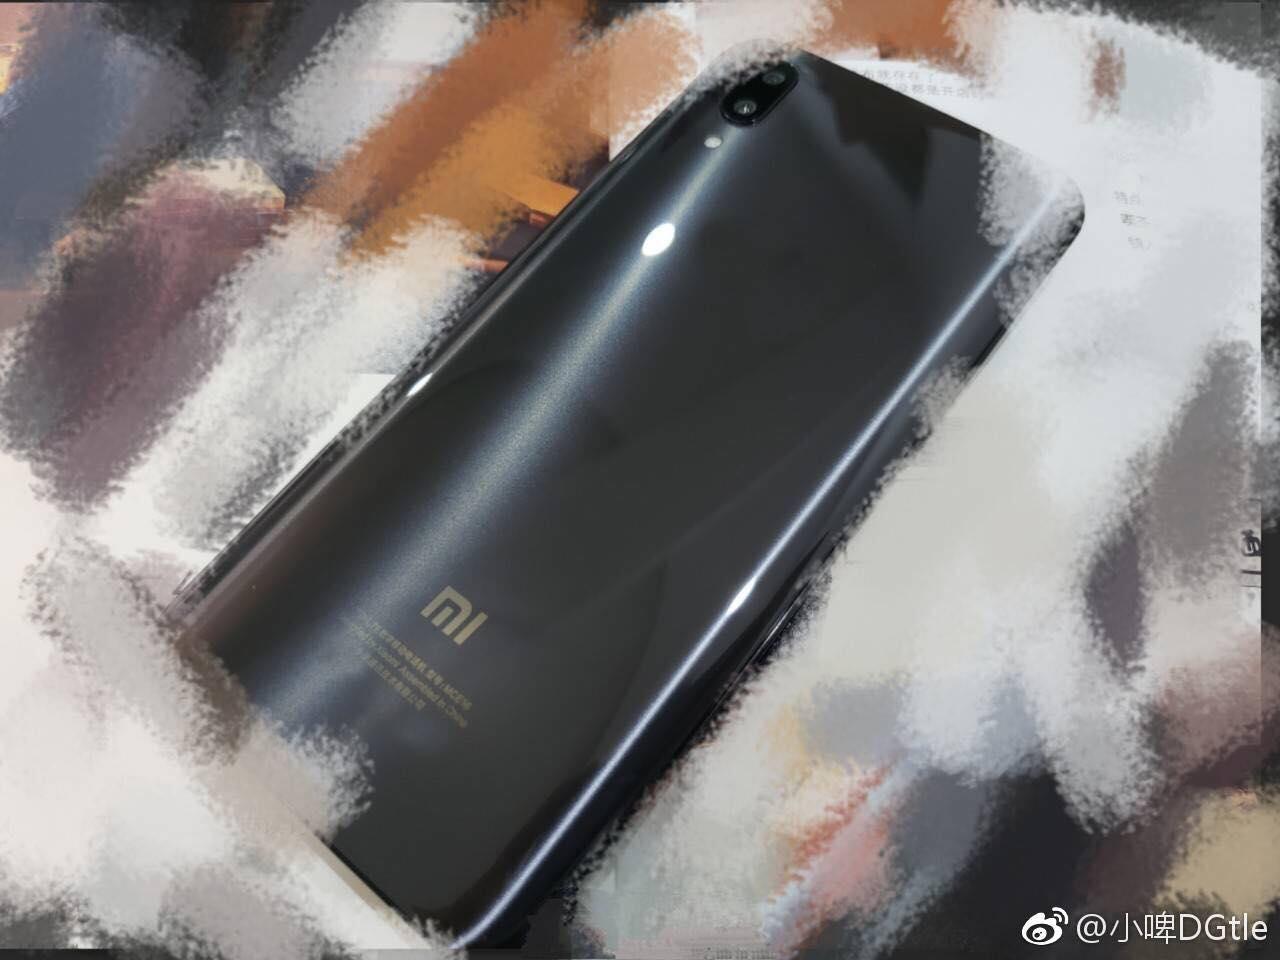 Imagen filtrada del Xiaomi Mi 7 - Posterior